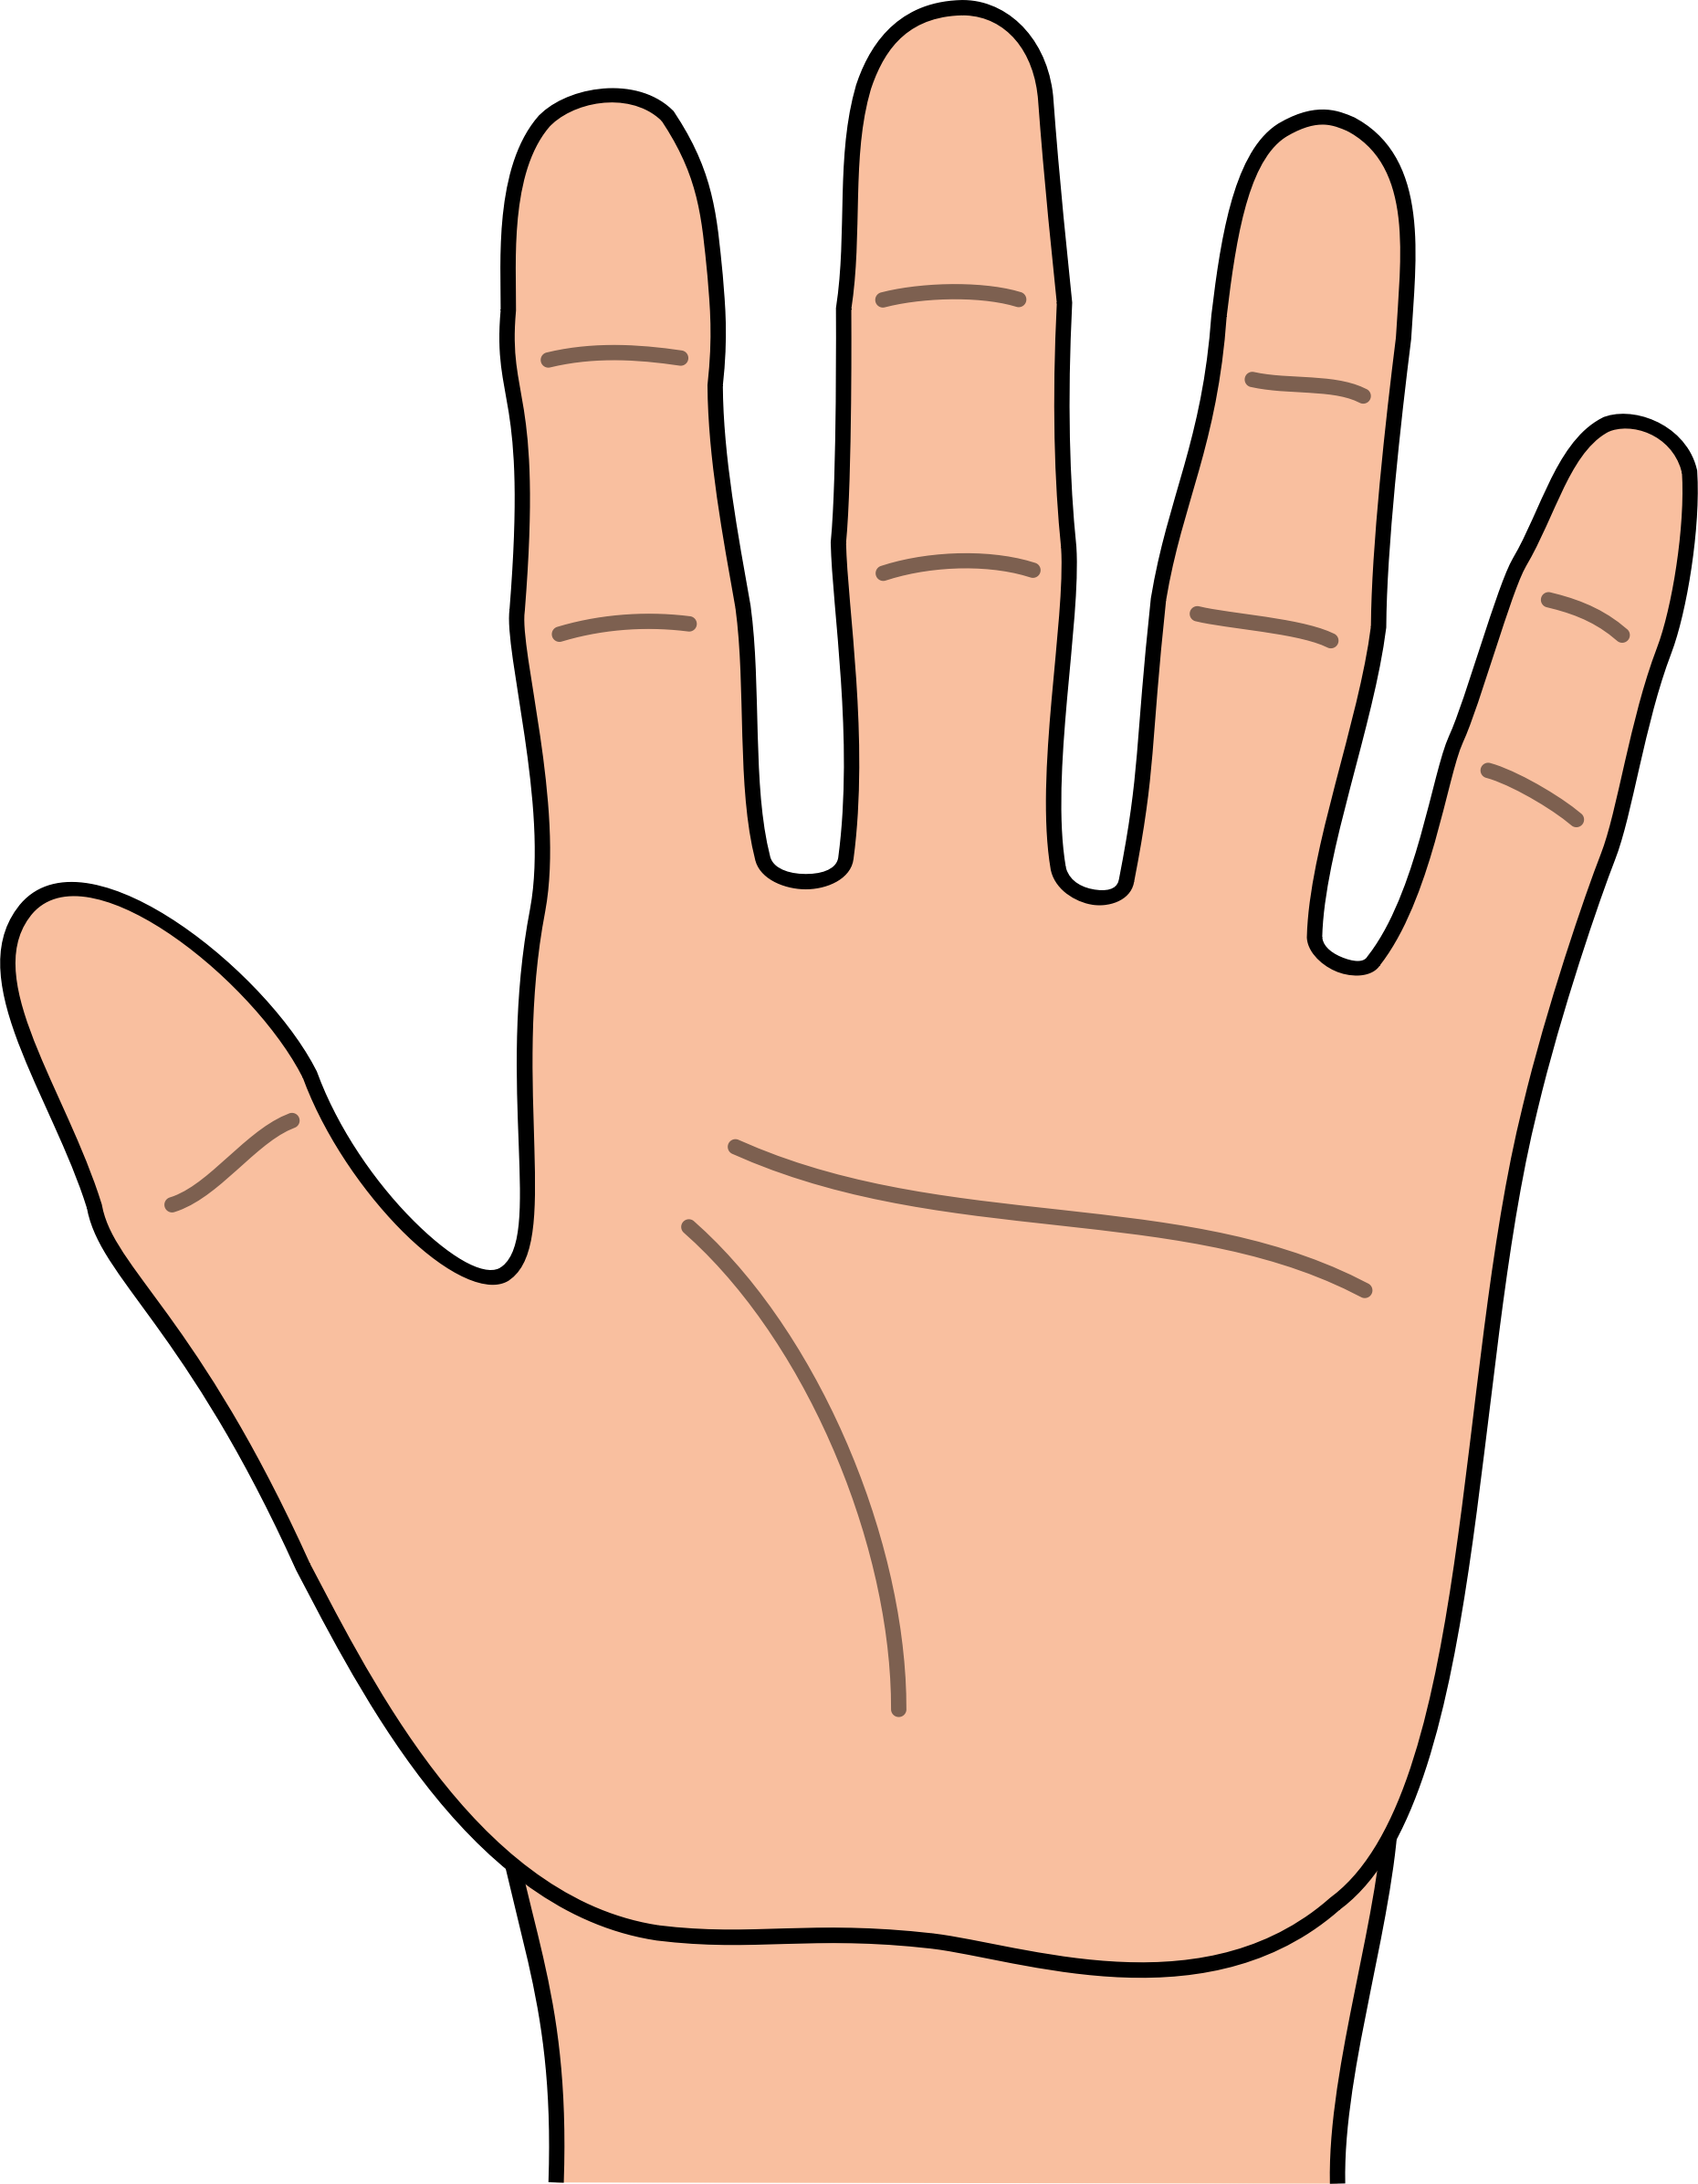 Hand Clip Art U0026middot; Hand Clipart-Hand Clip Art u0026middot; hand clipart-6